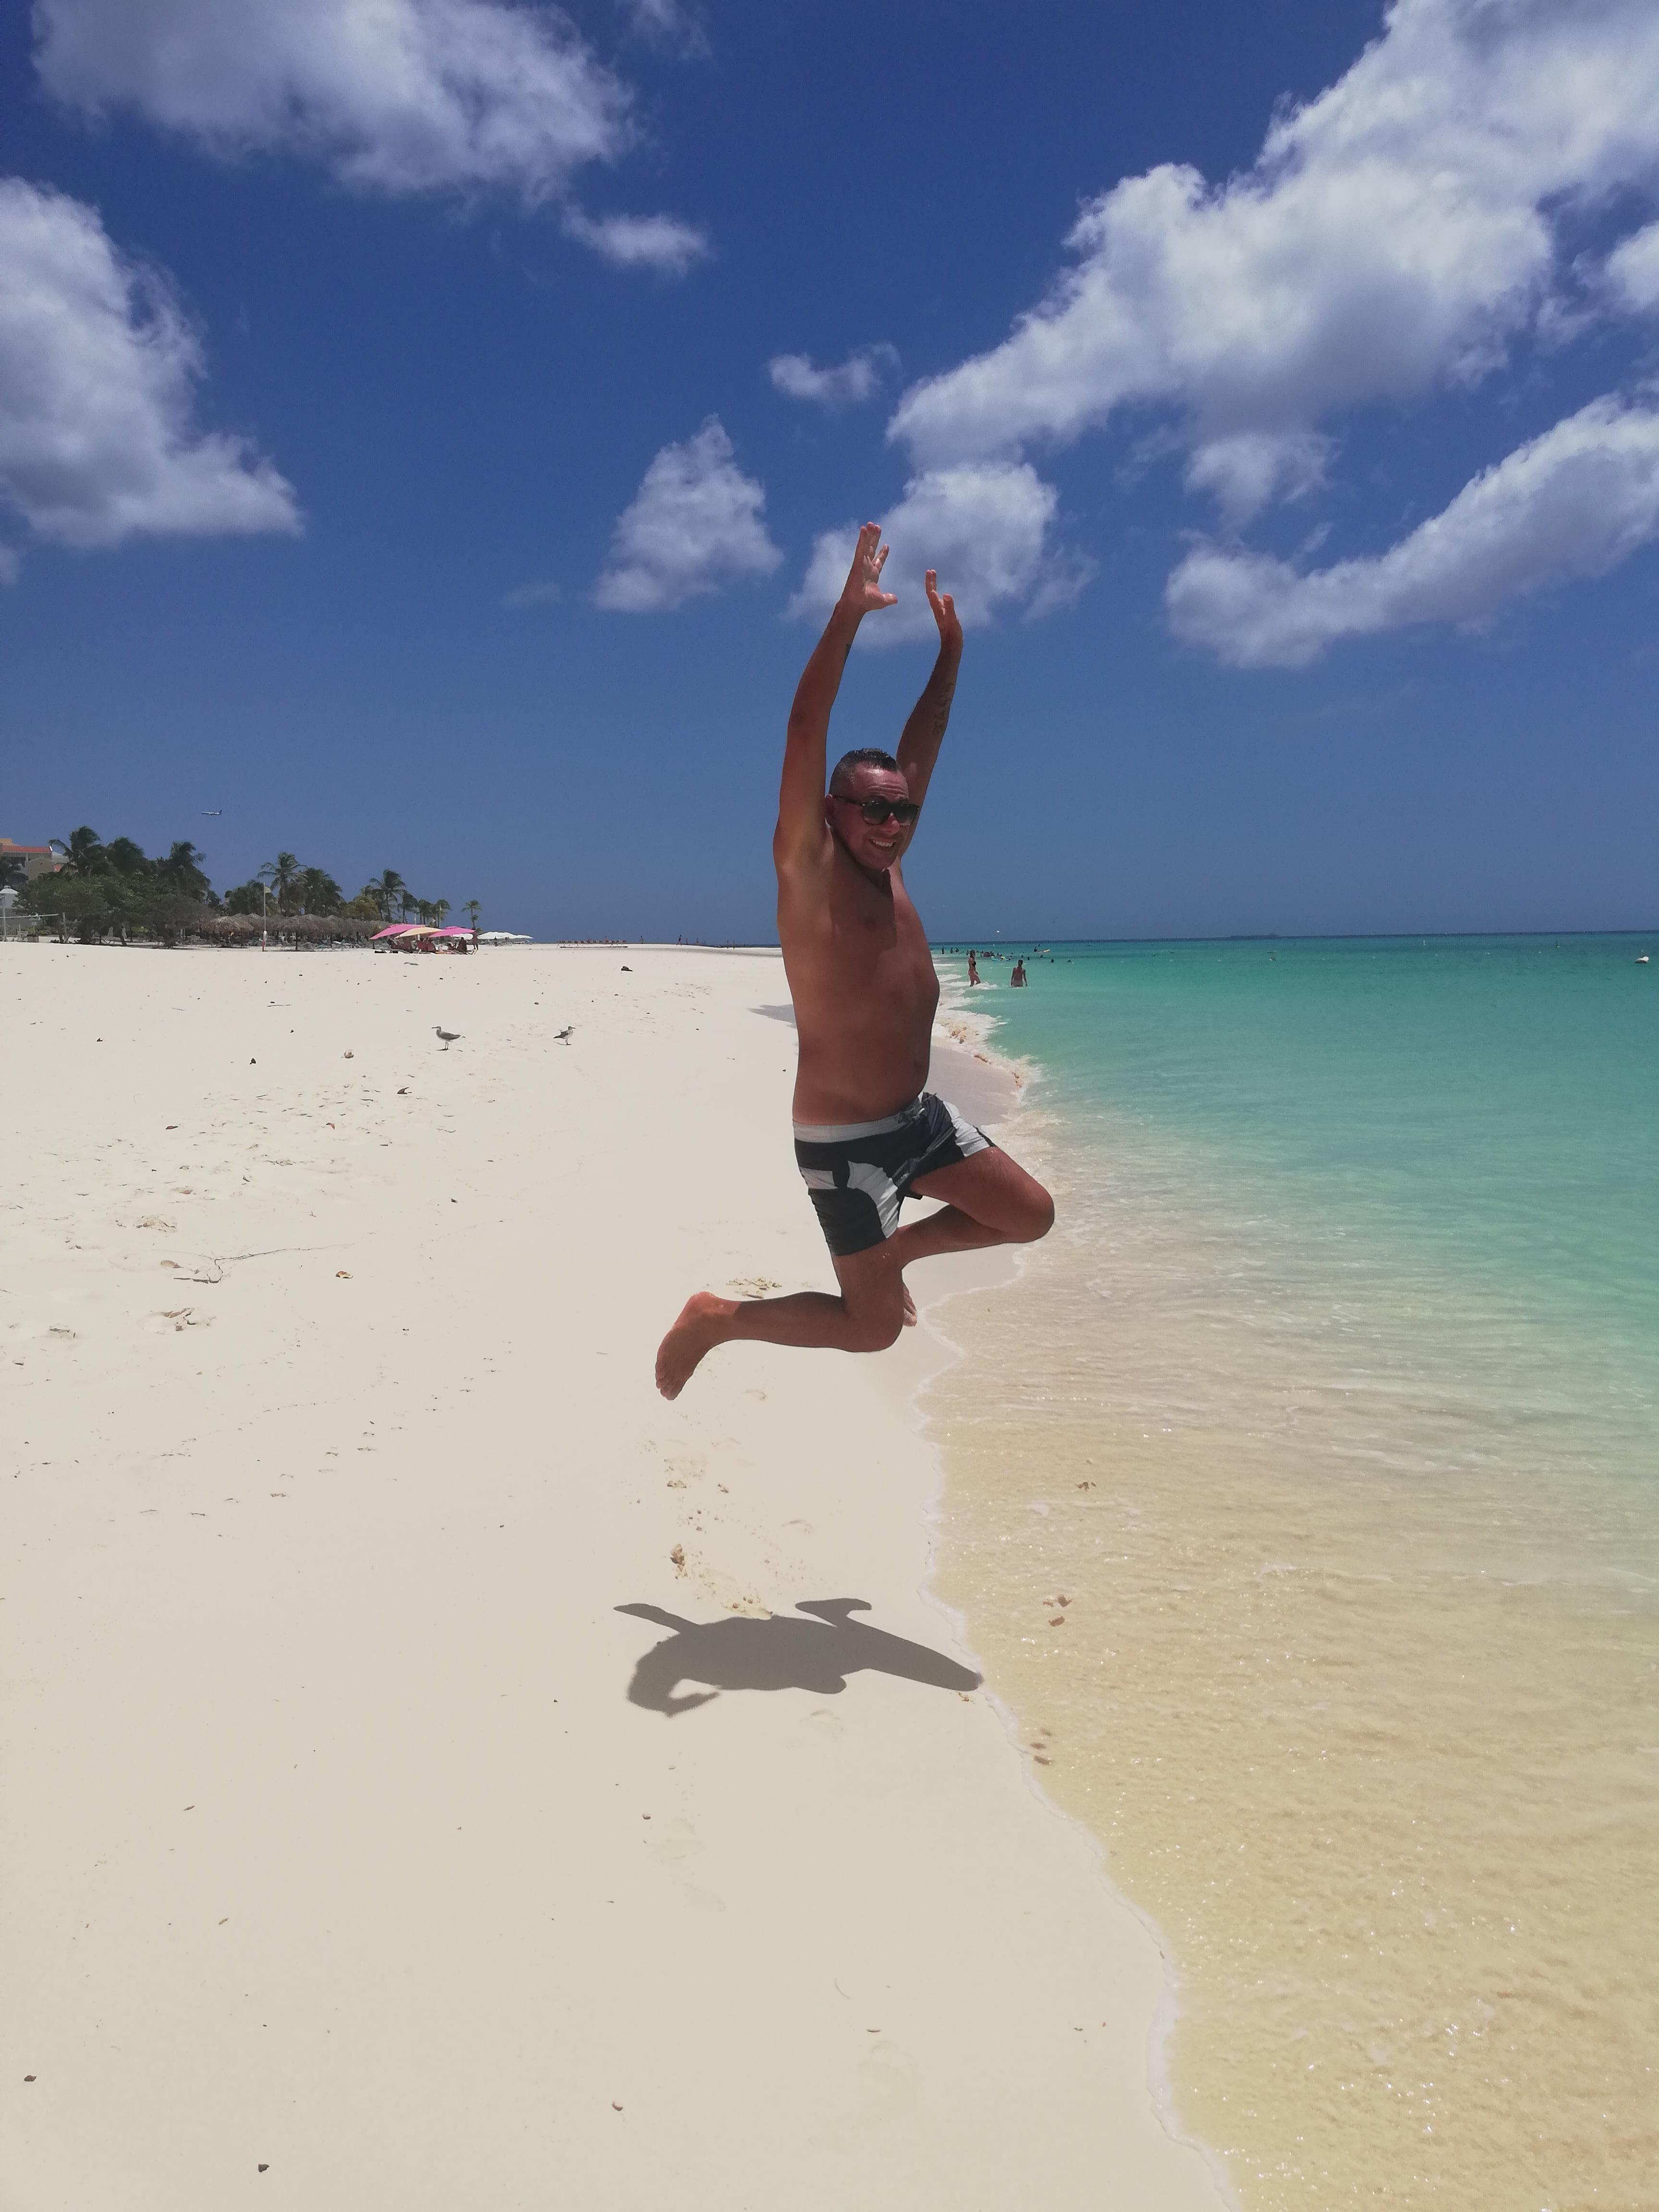 SPIAGGE DI ARUBA, UN SALTO A EAGLE BEACH